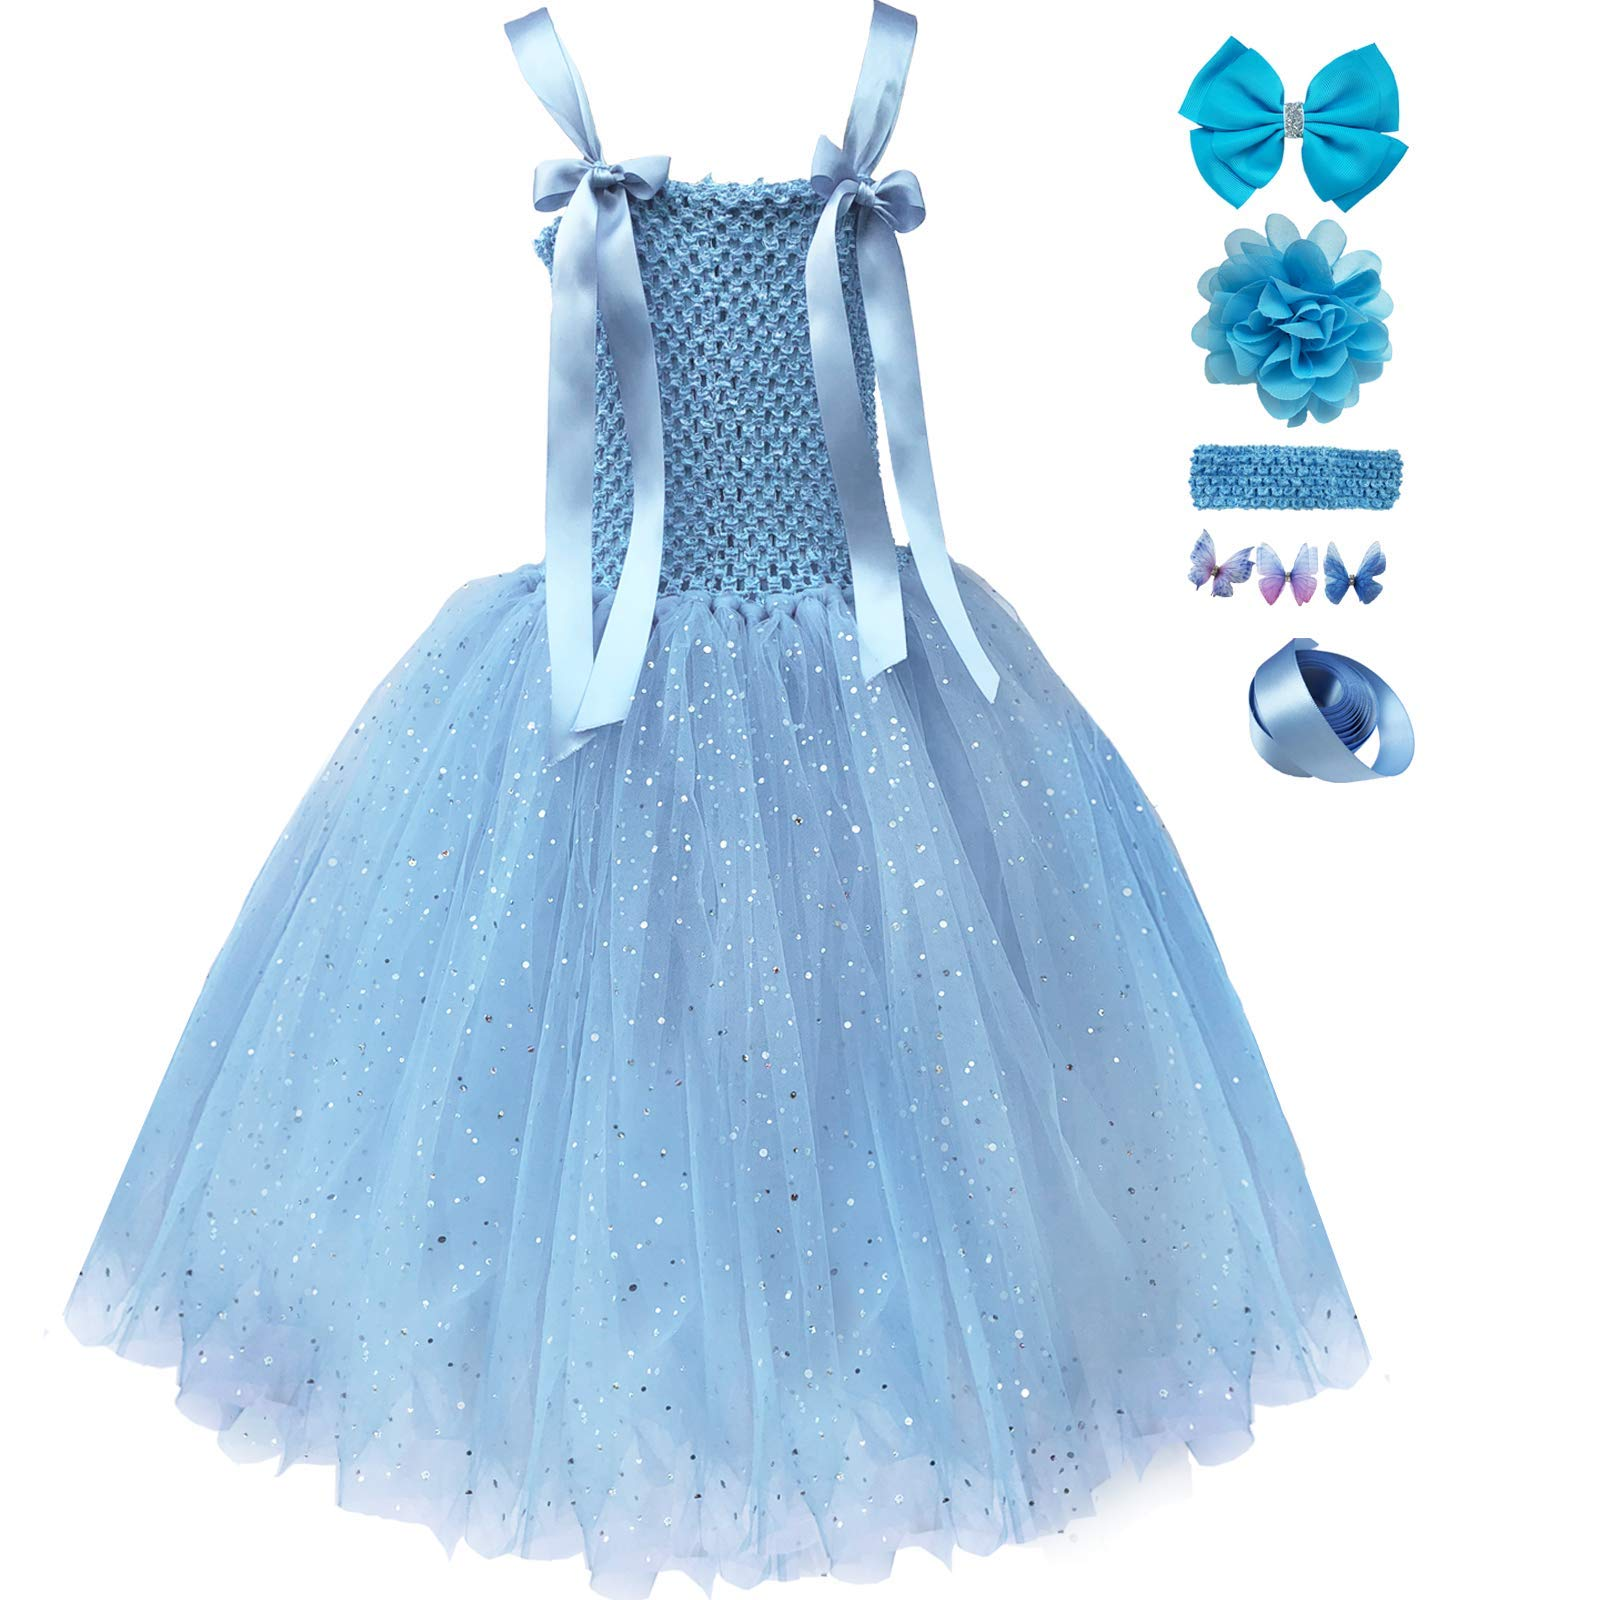 f3b55e7c4 Galleon - Girls Princess Tutu Elsa Party Dress Sequin Tulle Sleeveless Long  Birthday Dresses For Baby And Toddler Girll (2T-3T, Light Blue)